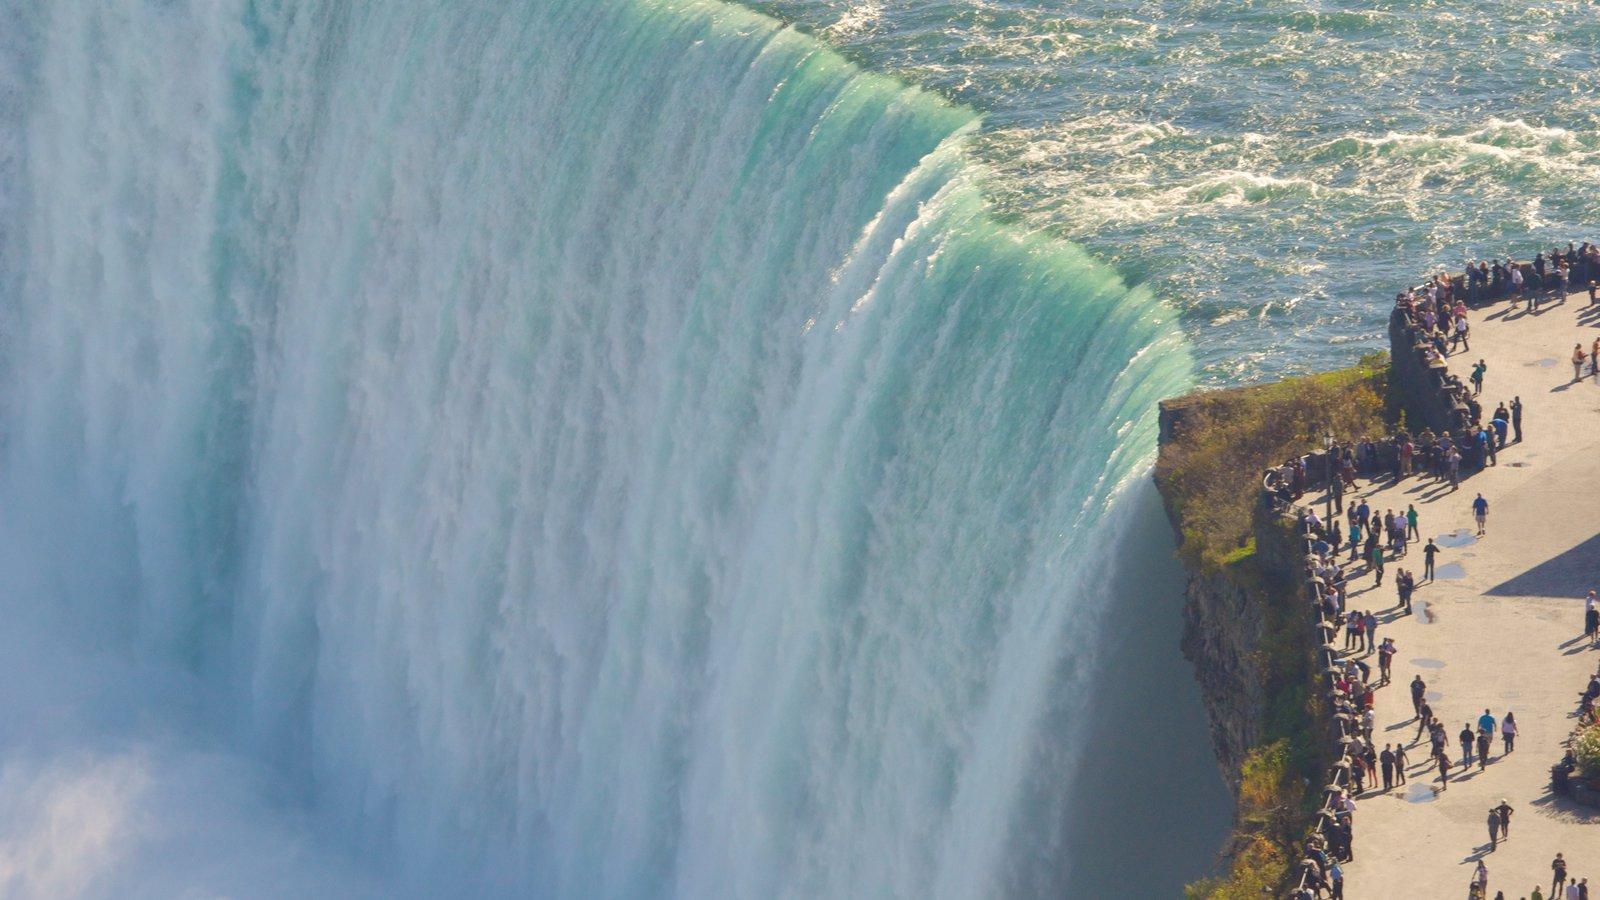 Niagara Falls caracterizando paisagens e uma cascata